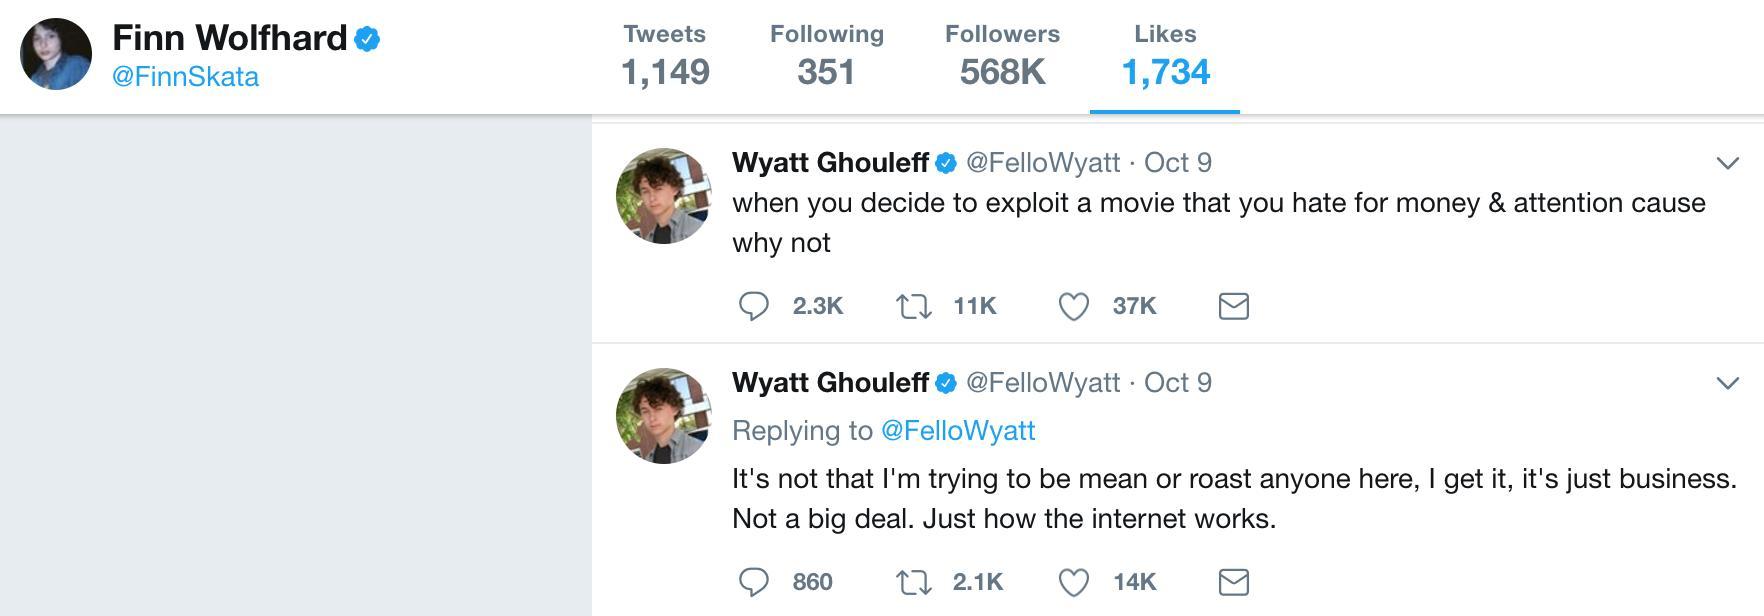 Finn Wolfhard Twitter Likes